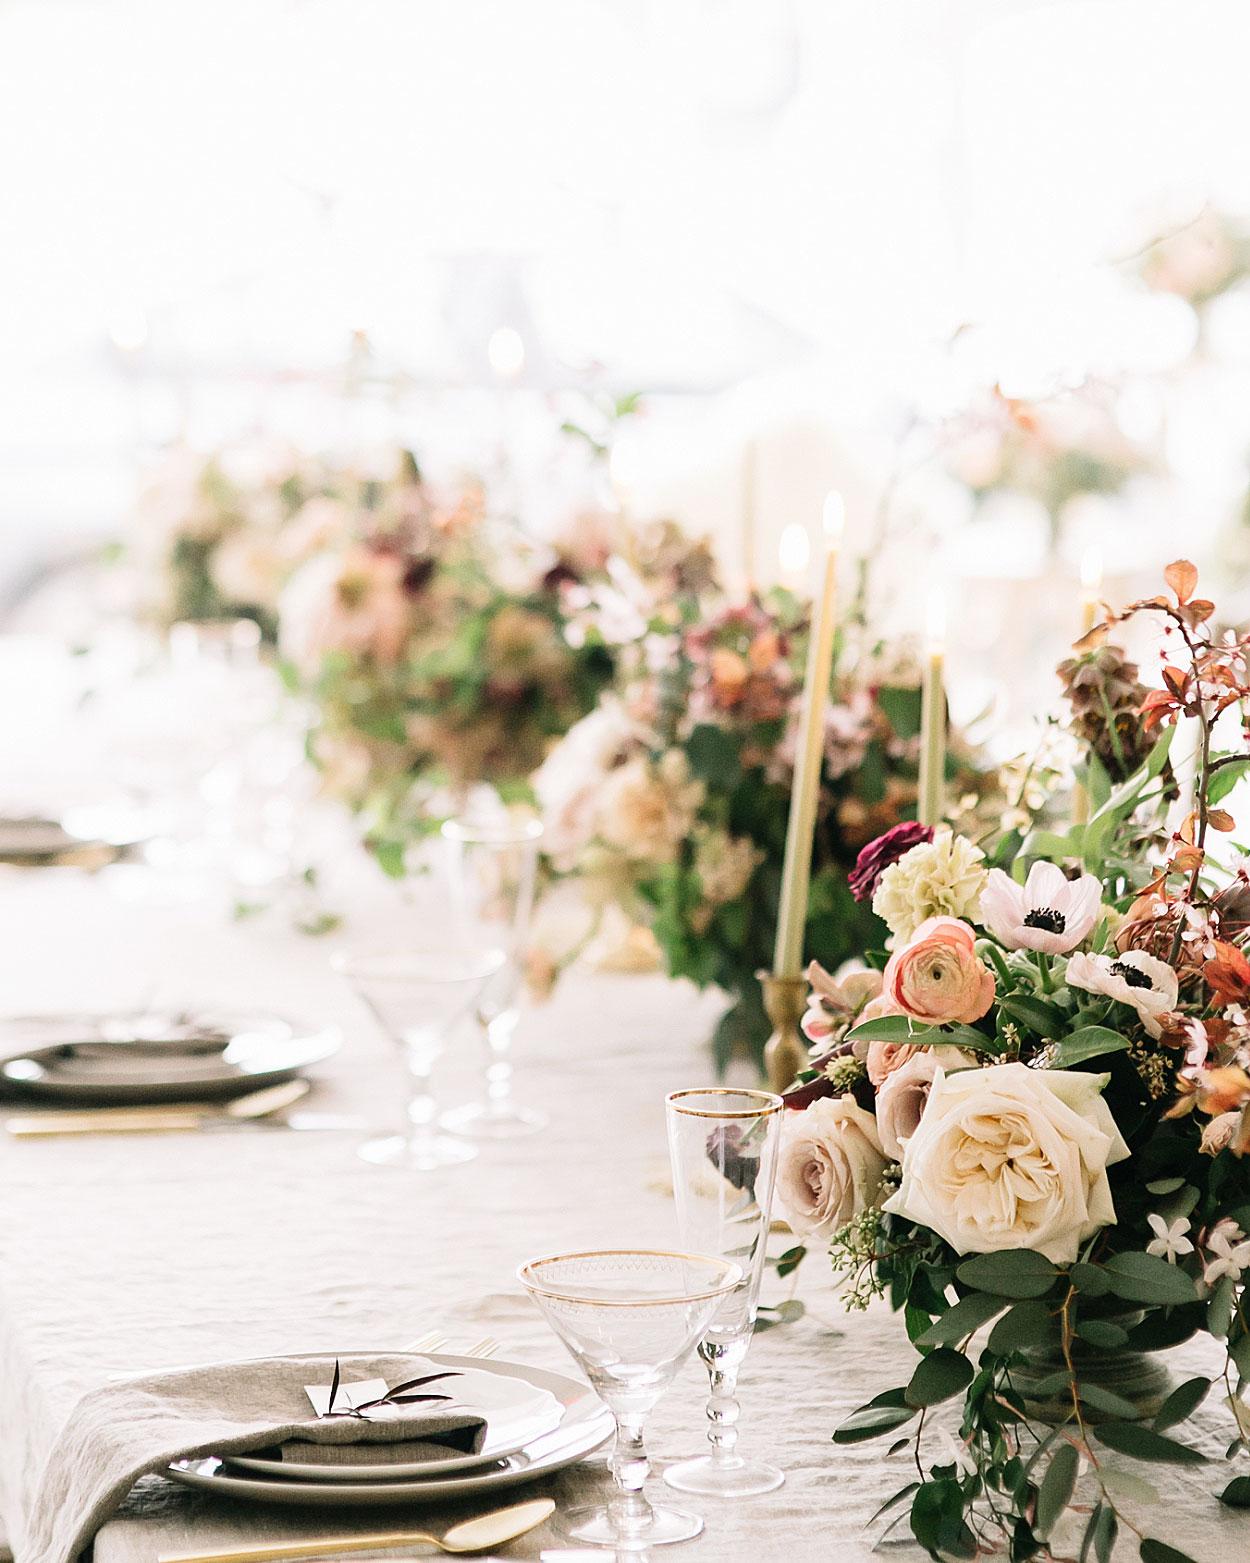 romantic-wedding-flowers-table-styling-0516.jpg